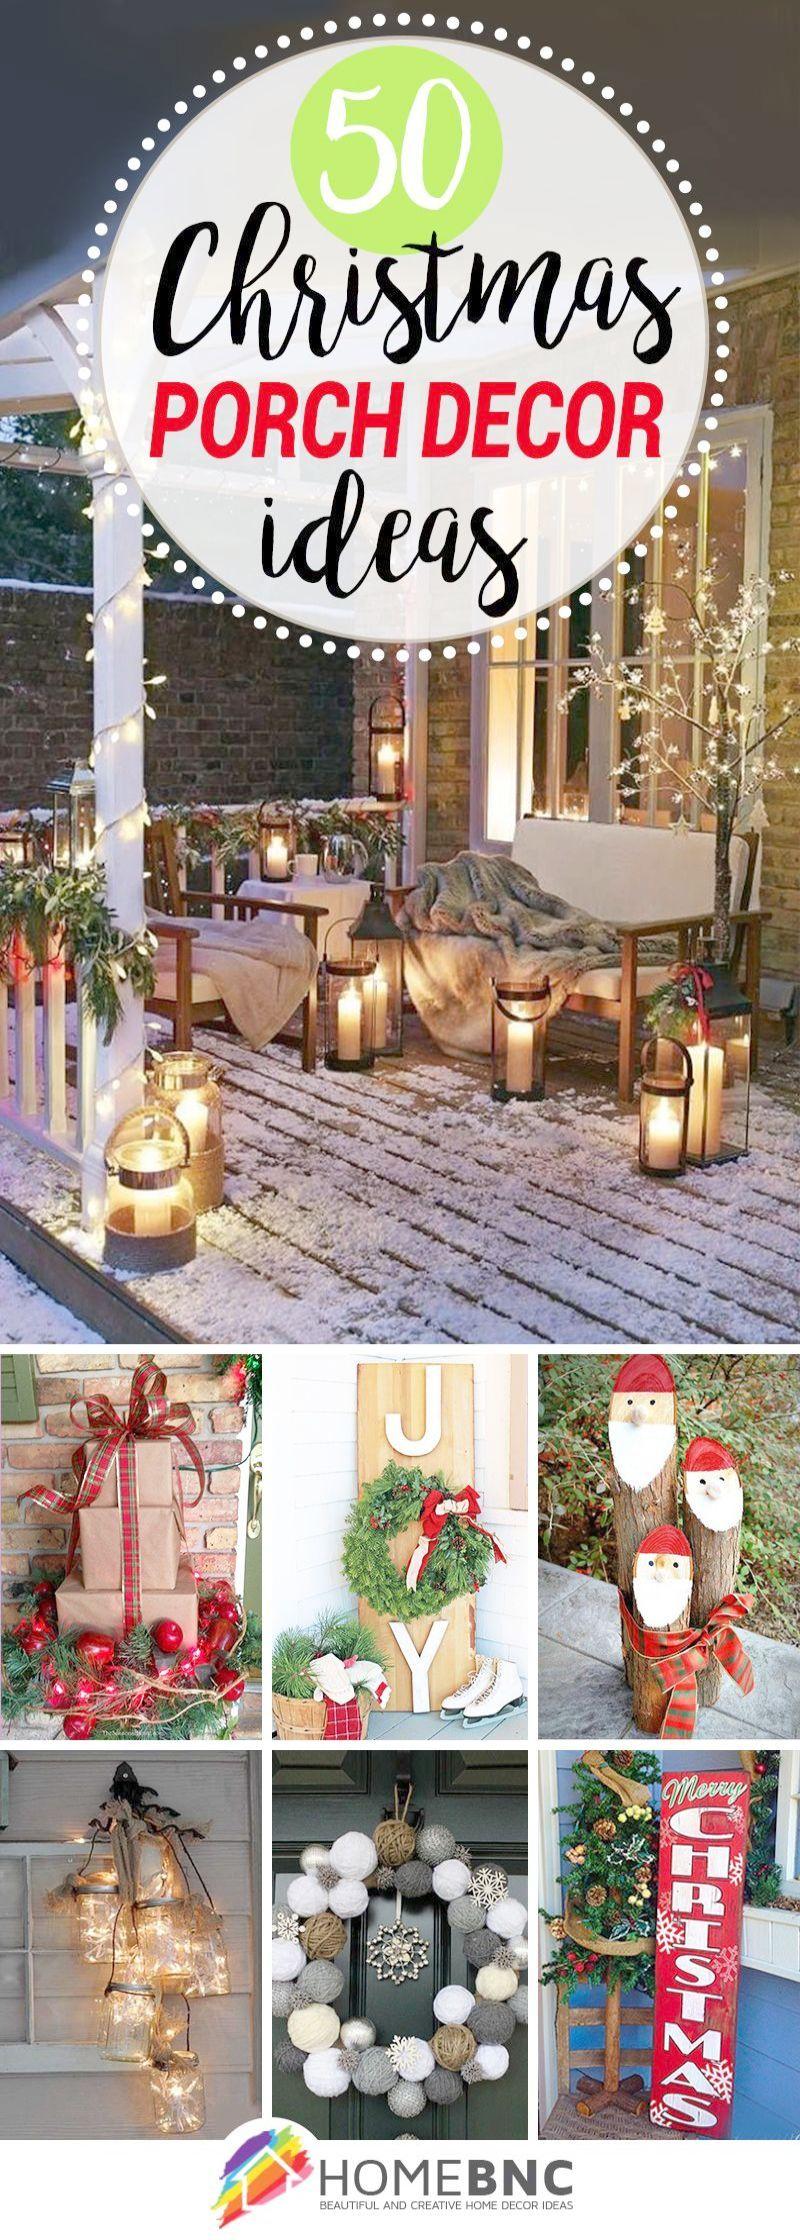 Sweet Christmas Decorations Wholesale Uk Crafts Diy